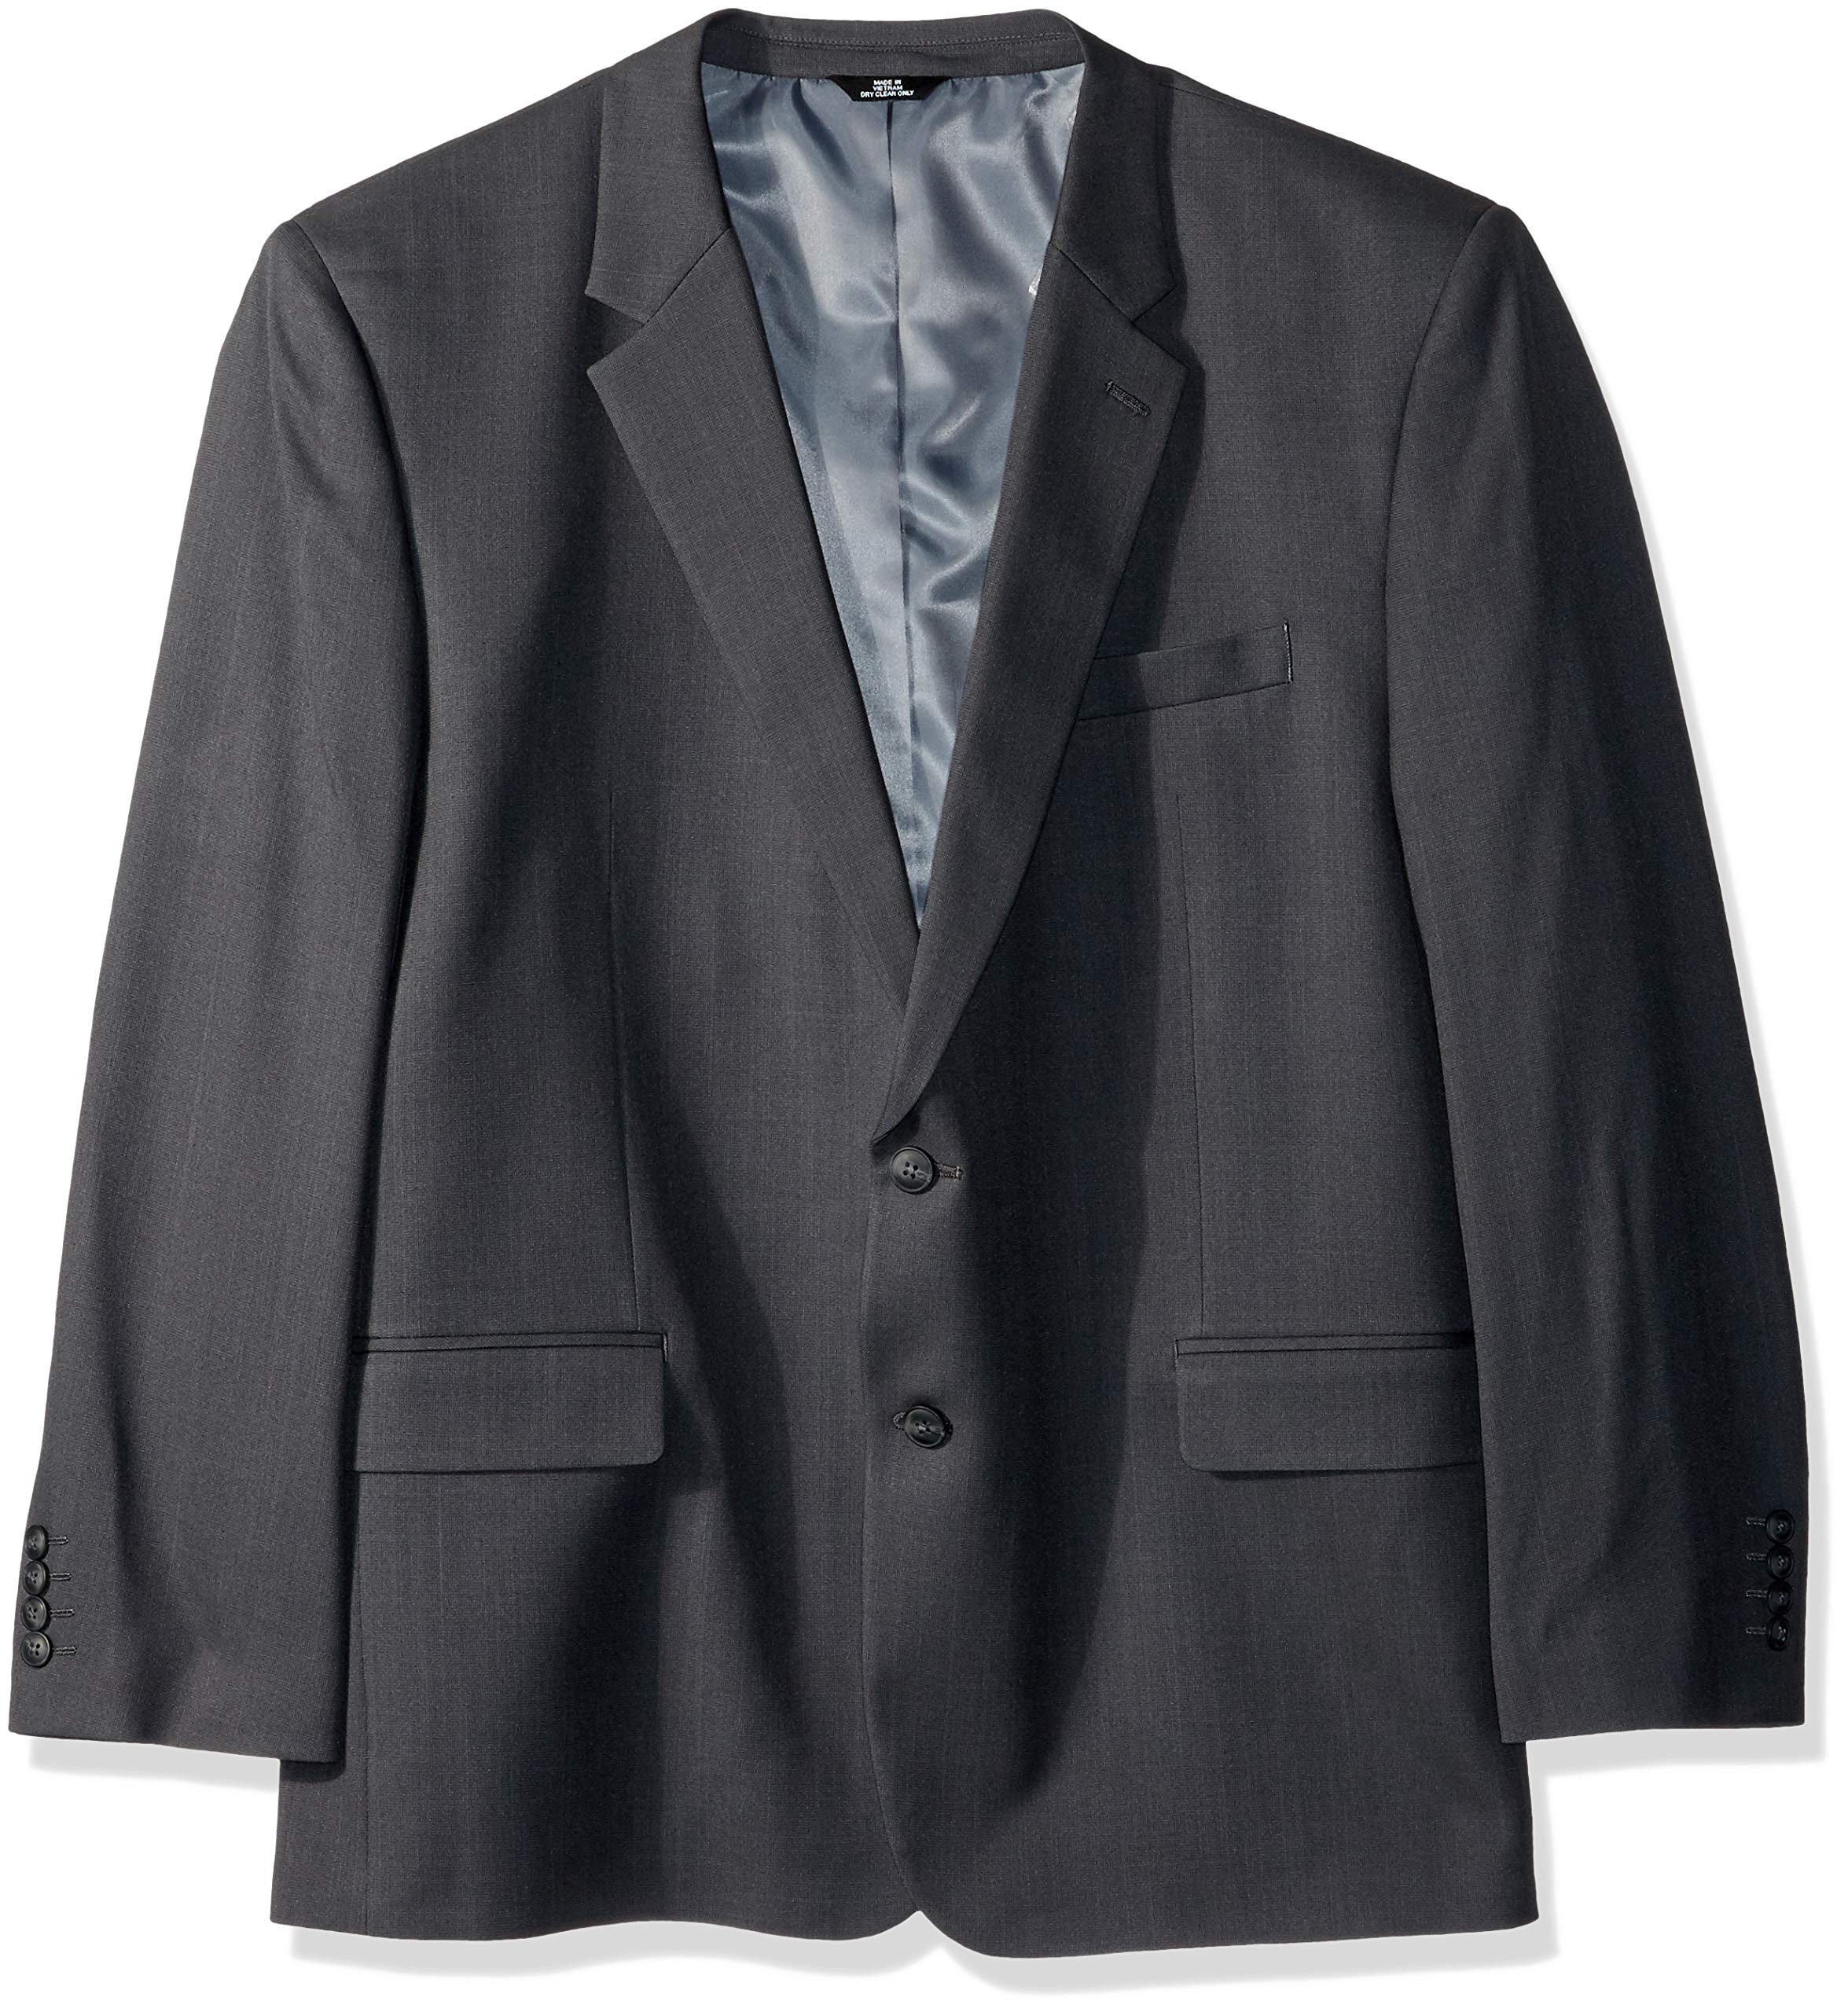 Haggar Men's Big and Tall B&T Stria Tic Stretch Classic Fit Suit Separate Coat, Dark Grey Heather, 52R